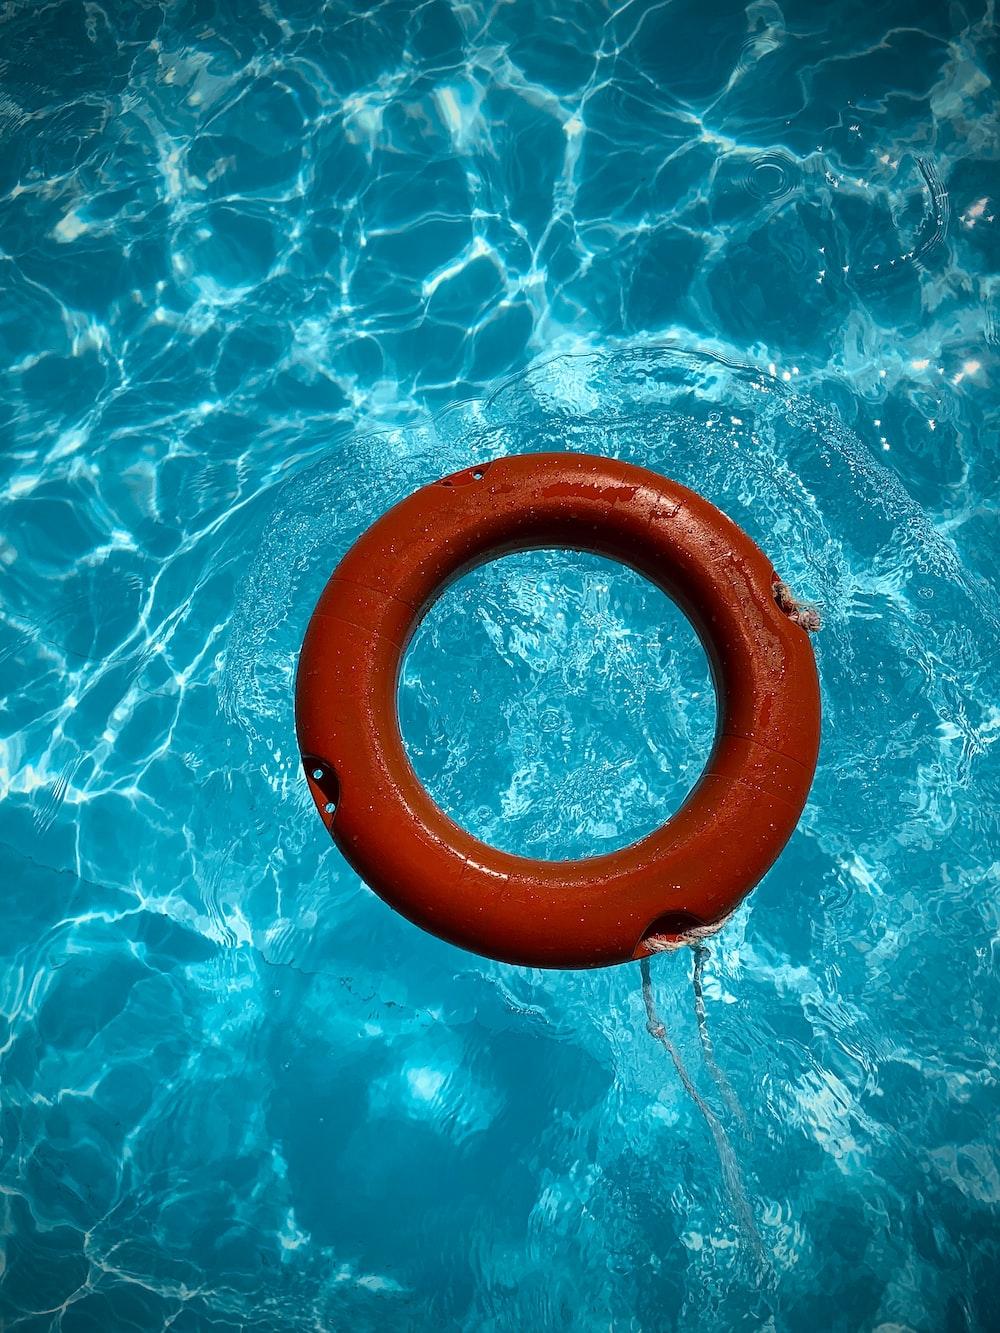 round red swim ring on body of water